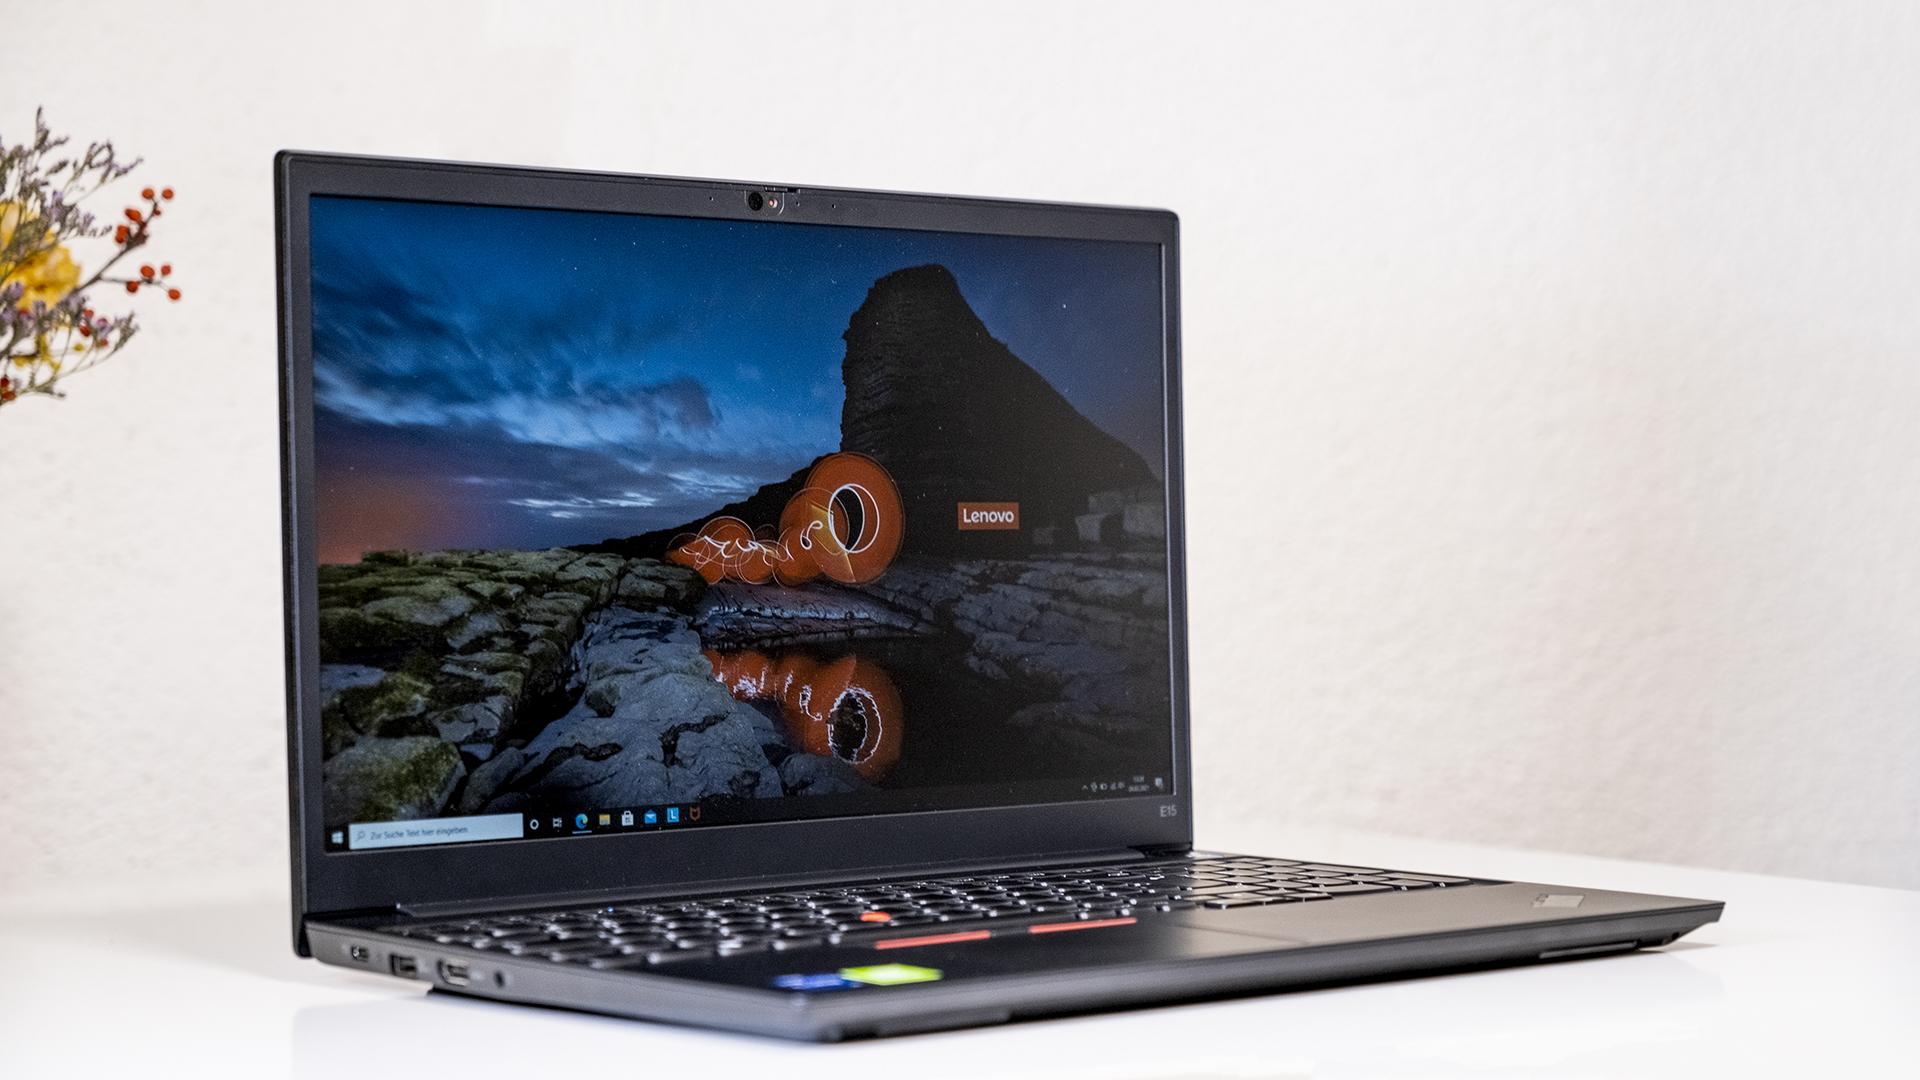 Lenovo ThinkPad E15 Frontal Schlussbild